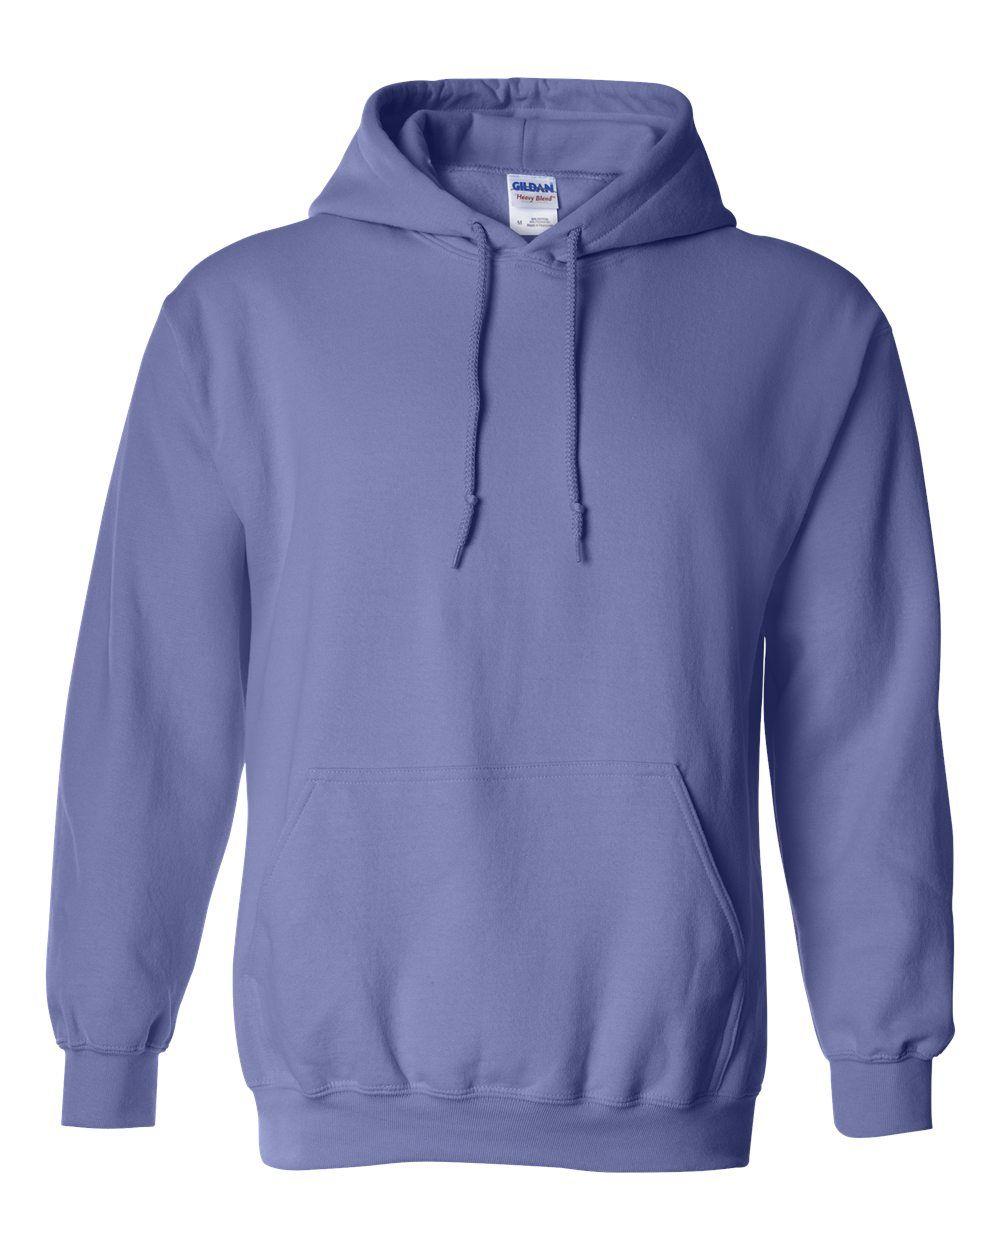 Gildan Heavy Blend Kapuzenpullover Hooded Sweat Sweatshirt Hoodie Pullover S-5XL